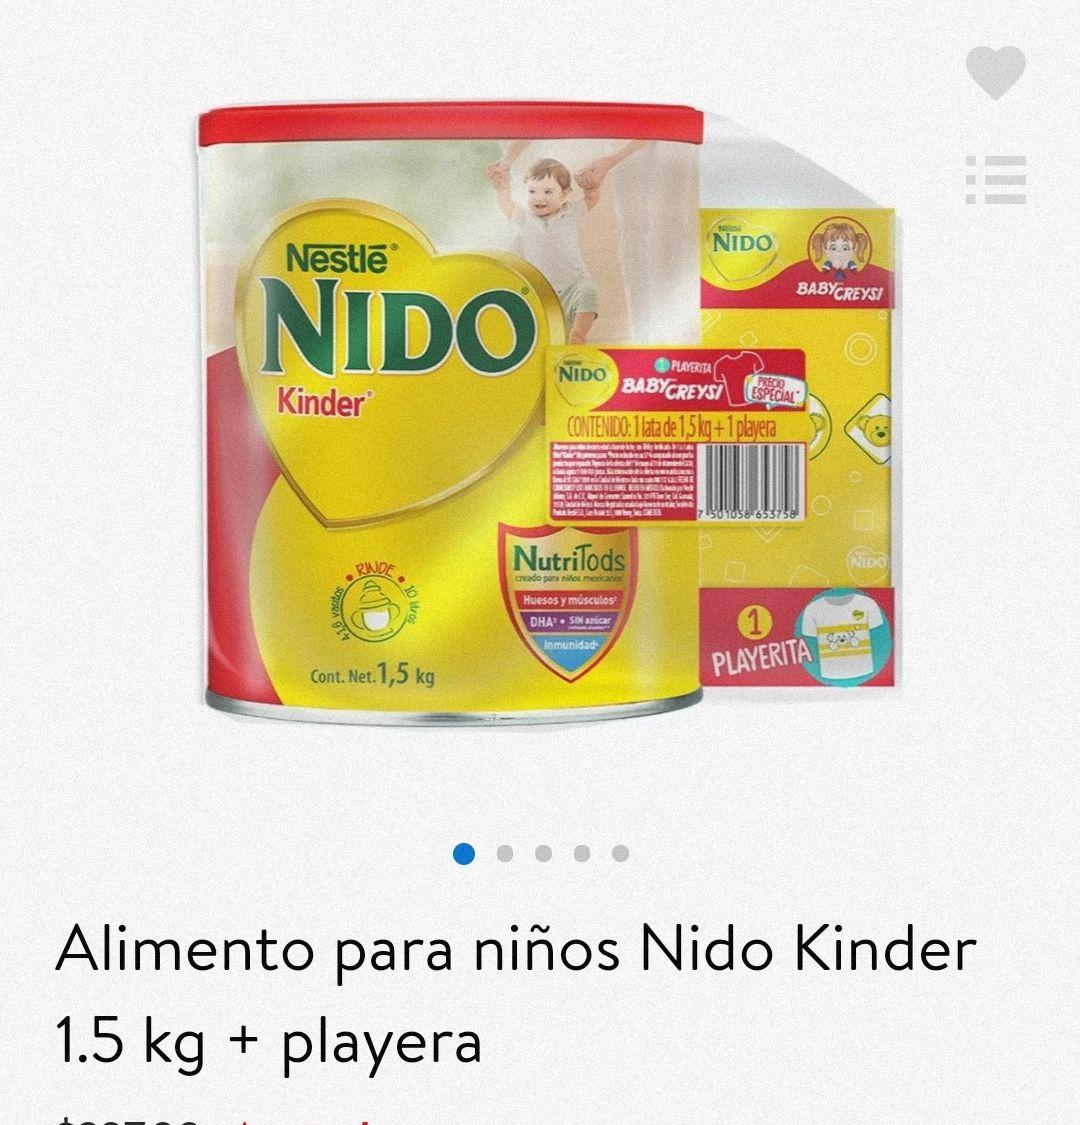 Bodega Aurrera: Nido Kinder 1.5 kg + playera